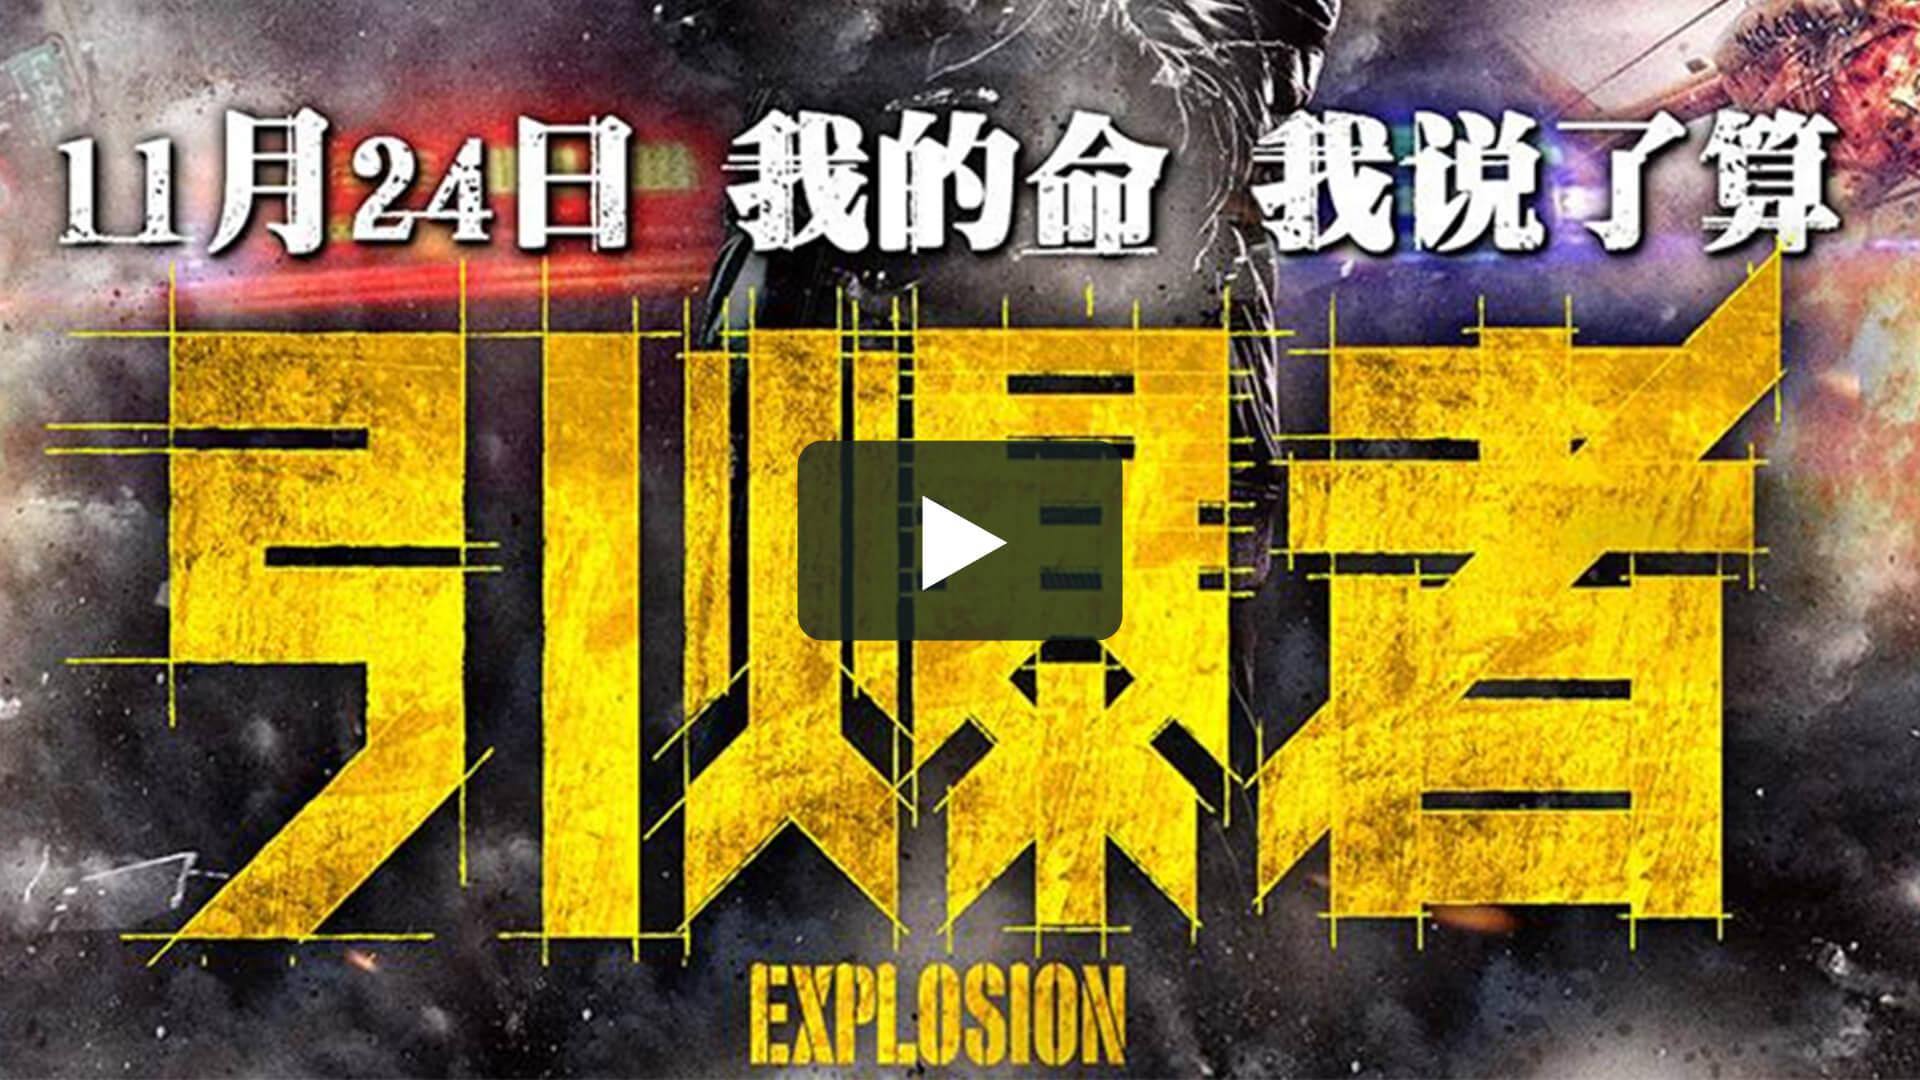 引爆者 - Explosion